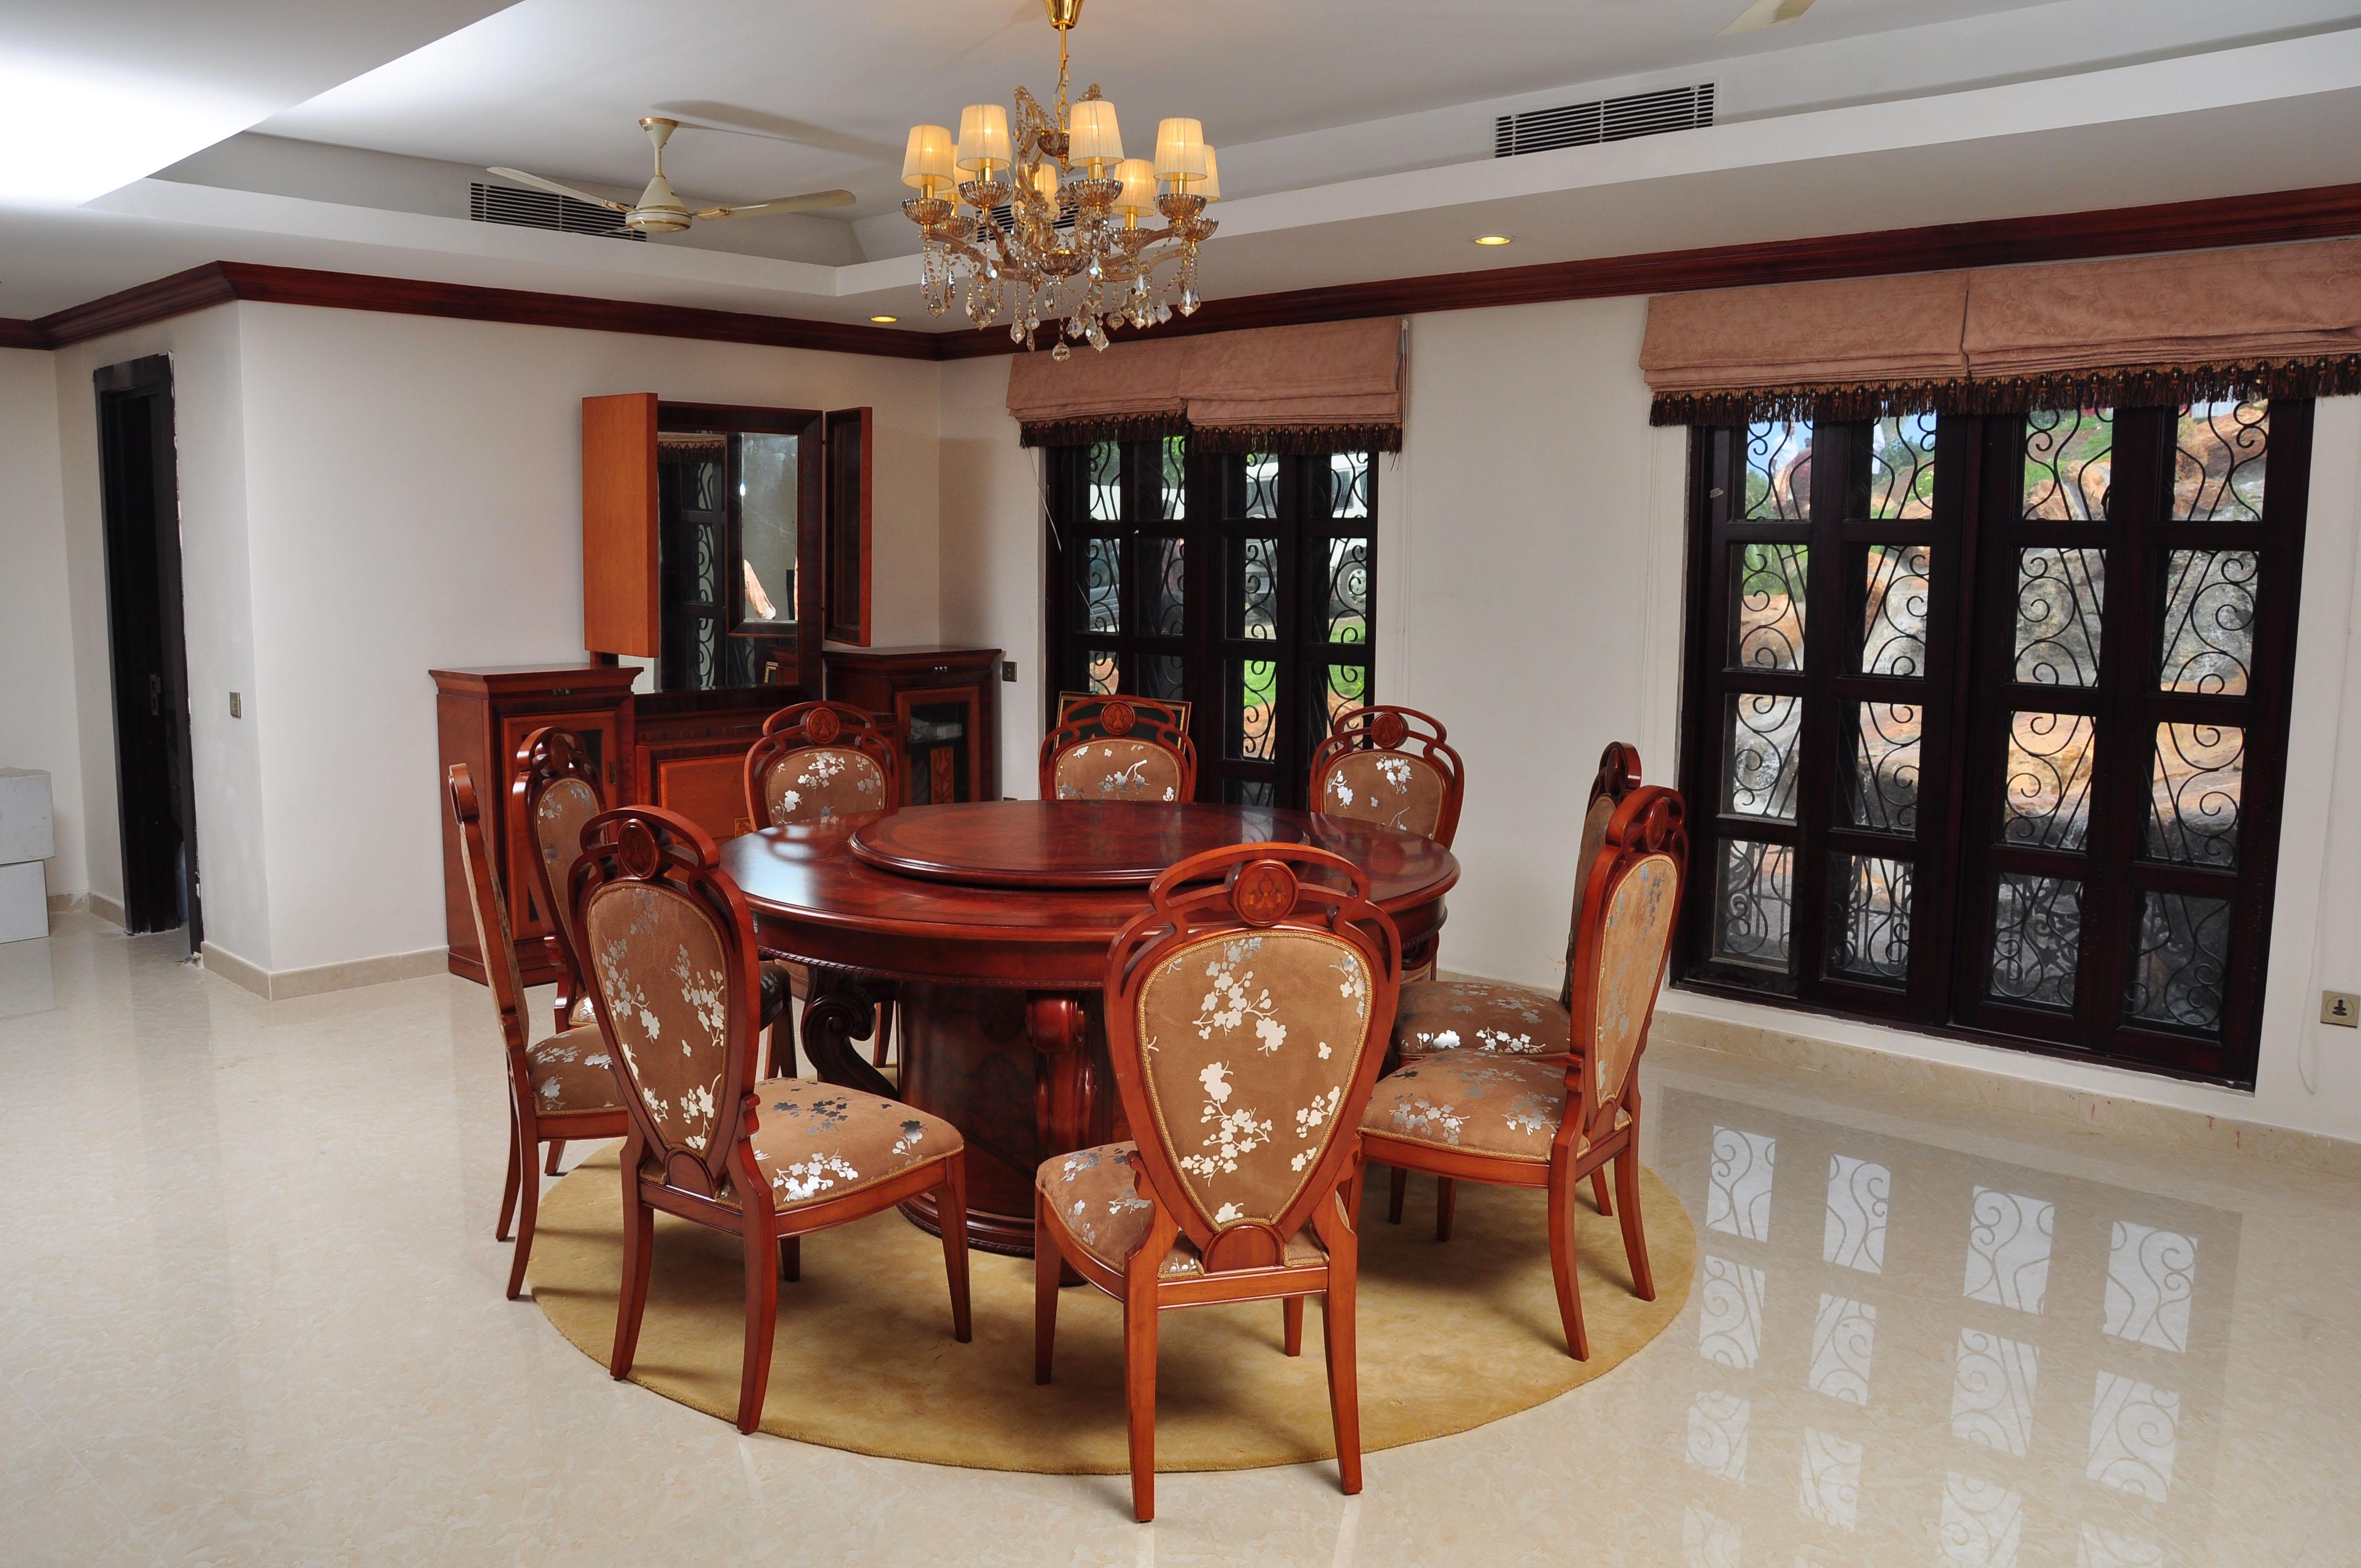 Royal Dining Room, Pretty, Rooms, Living, Light, HQ Photo